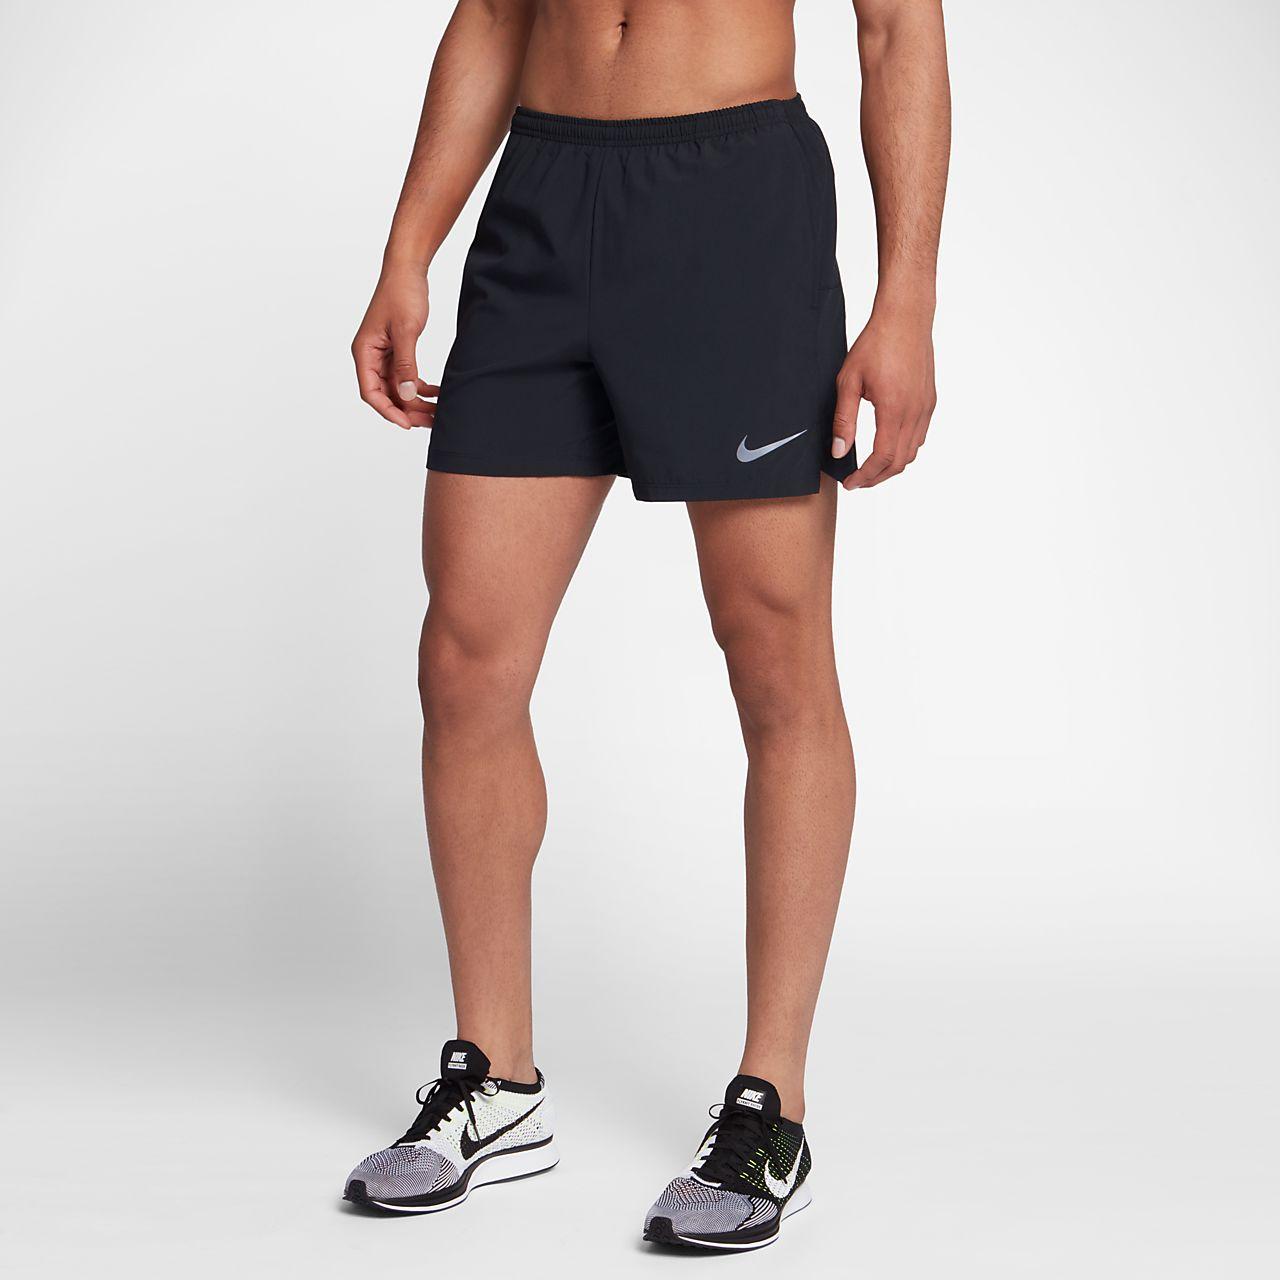 Nike Challenger Herren-Laufshorts (ca. 12,5 cm)